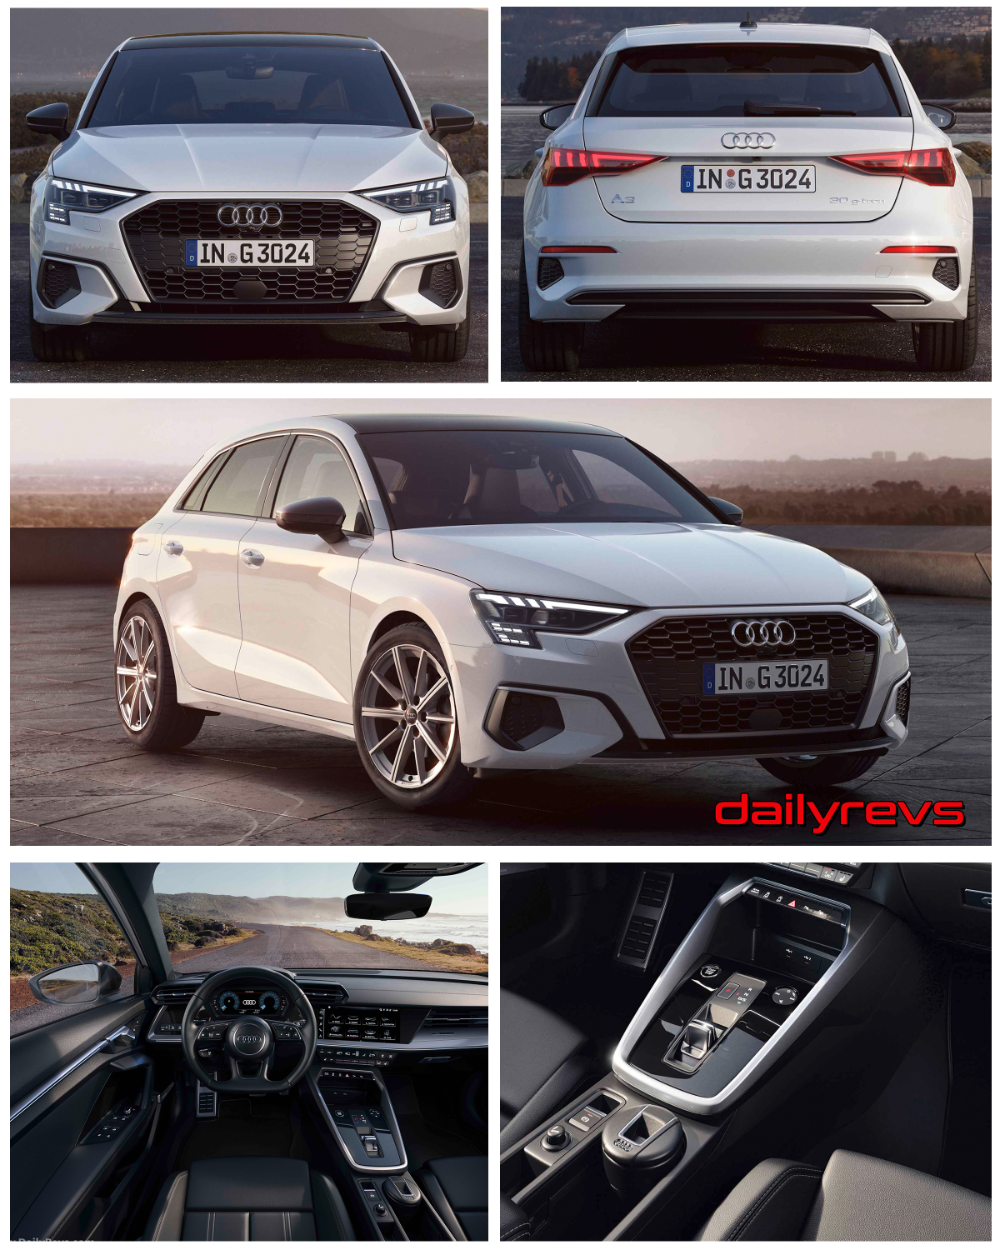 2021 Audi A3 Sportback 30 g-tron - Dailyrevs | Audi a3 ...